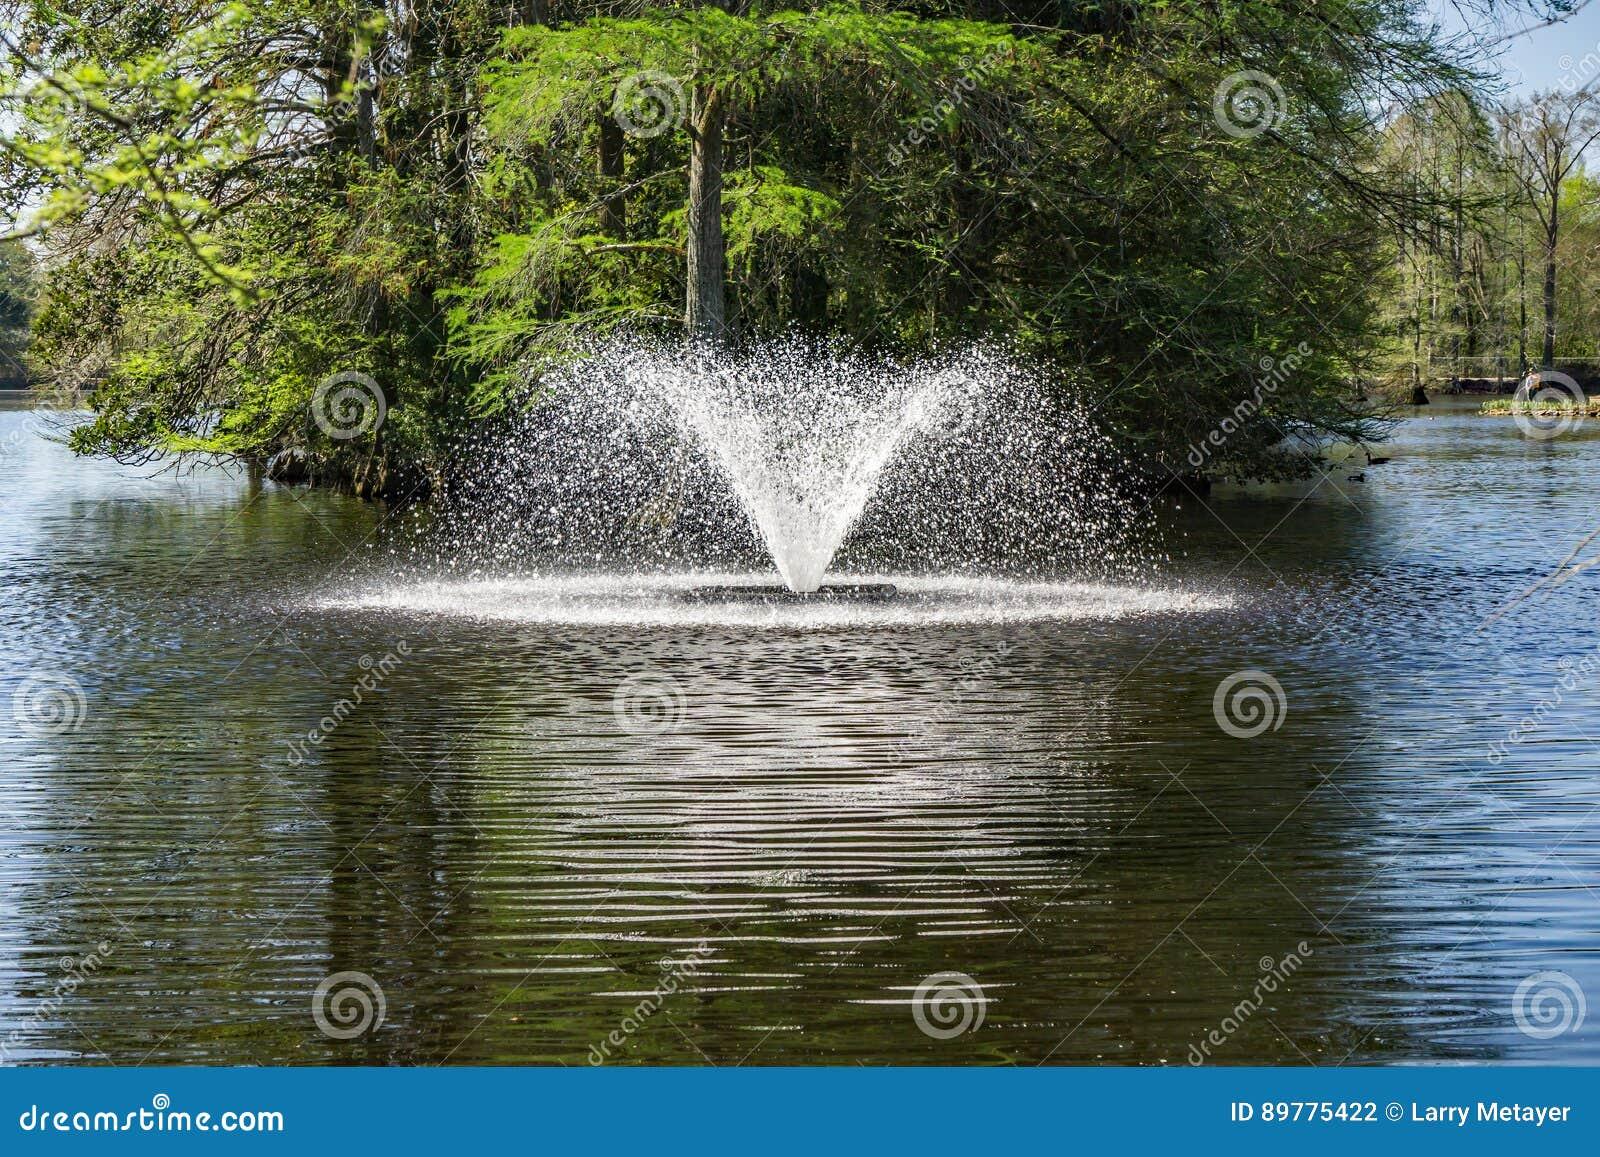 swan lake iris gardens sumter sc hours fasci garden